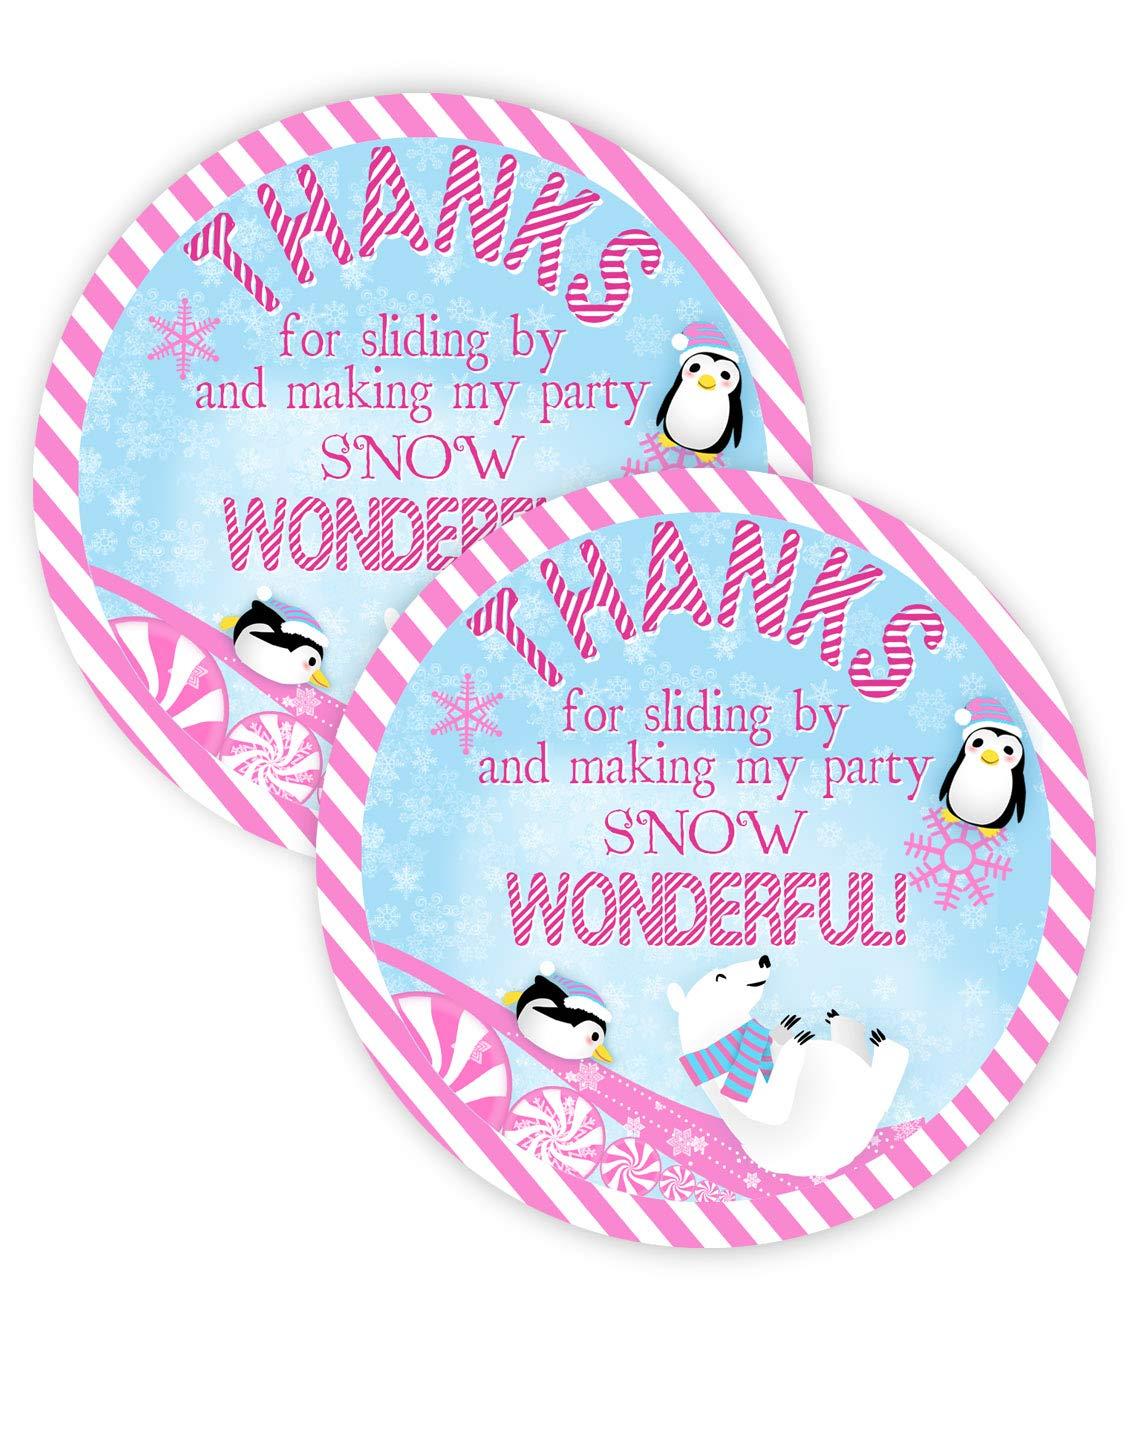 Winter Wonderland Pink Party Favor Stickers 40 Favor Bag Stickers